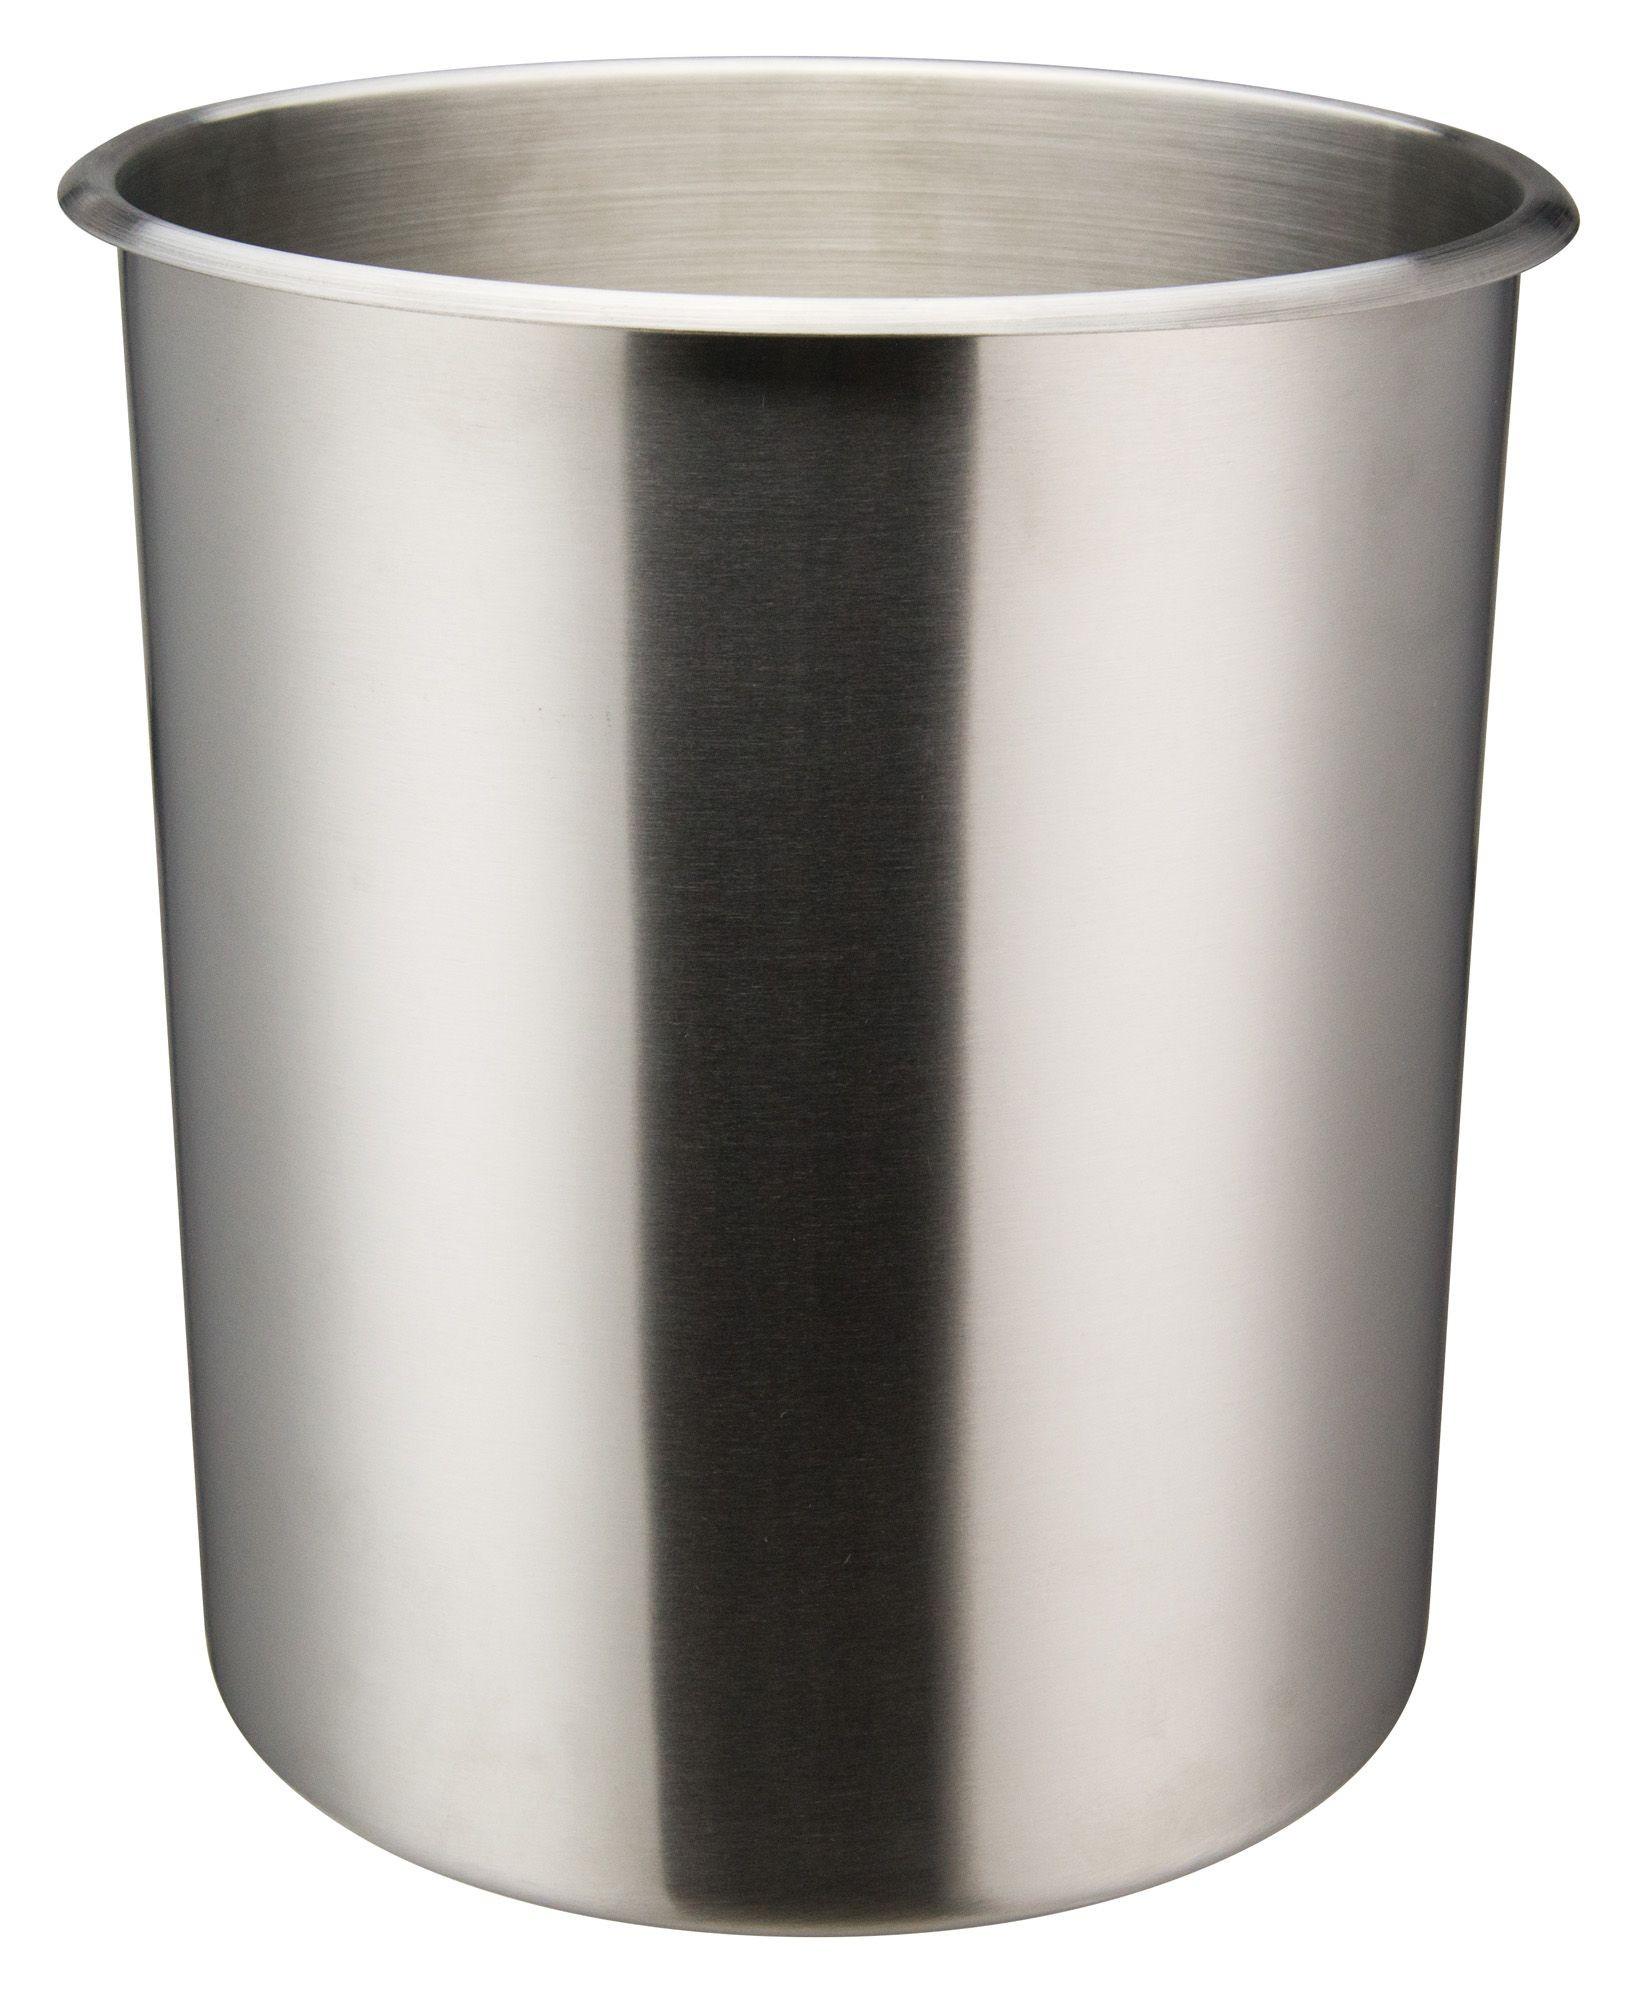 Winco BAMN-12 Stainless Steel Bain Marie Pot 12 Qt.